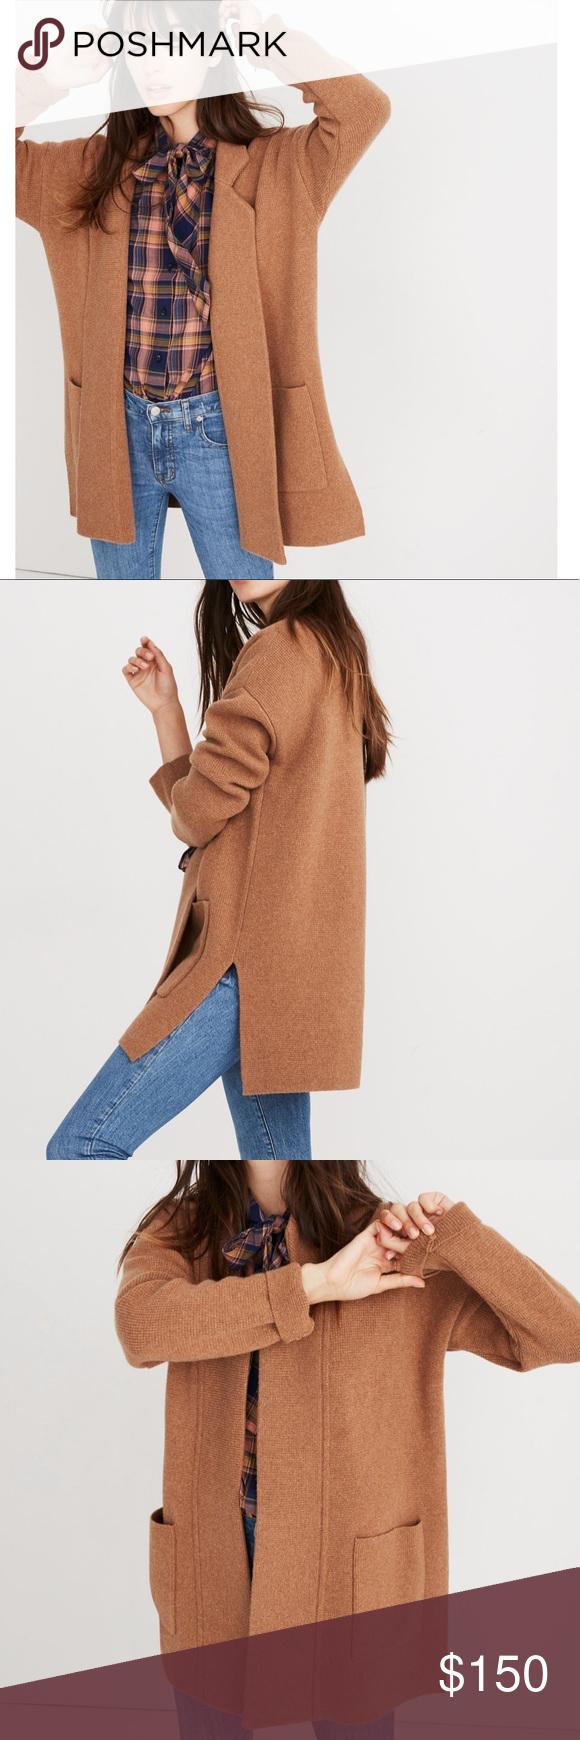 Sold Madewell Spencer Sweater Coat Heathr Caramel My Posh Closet